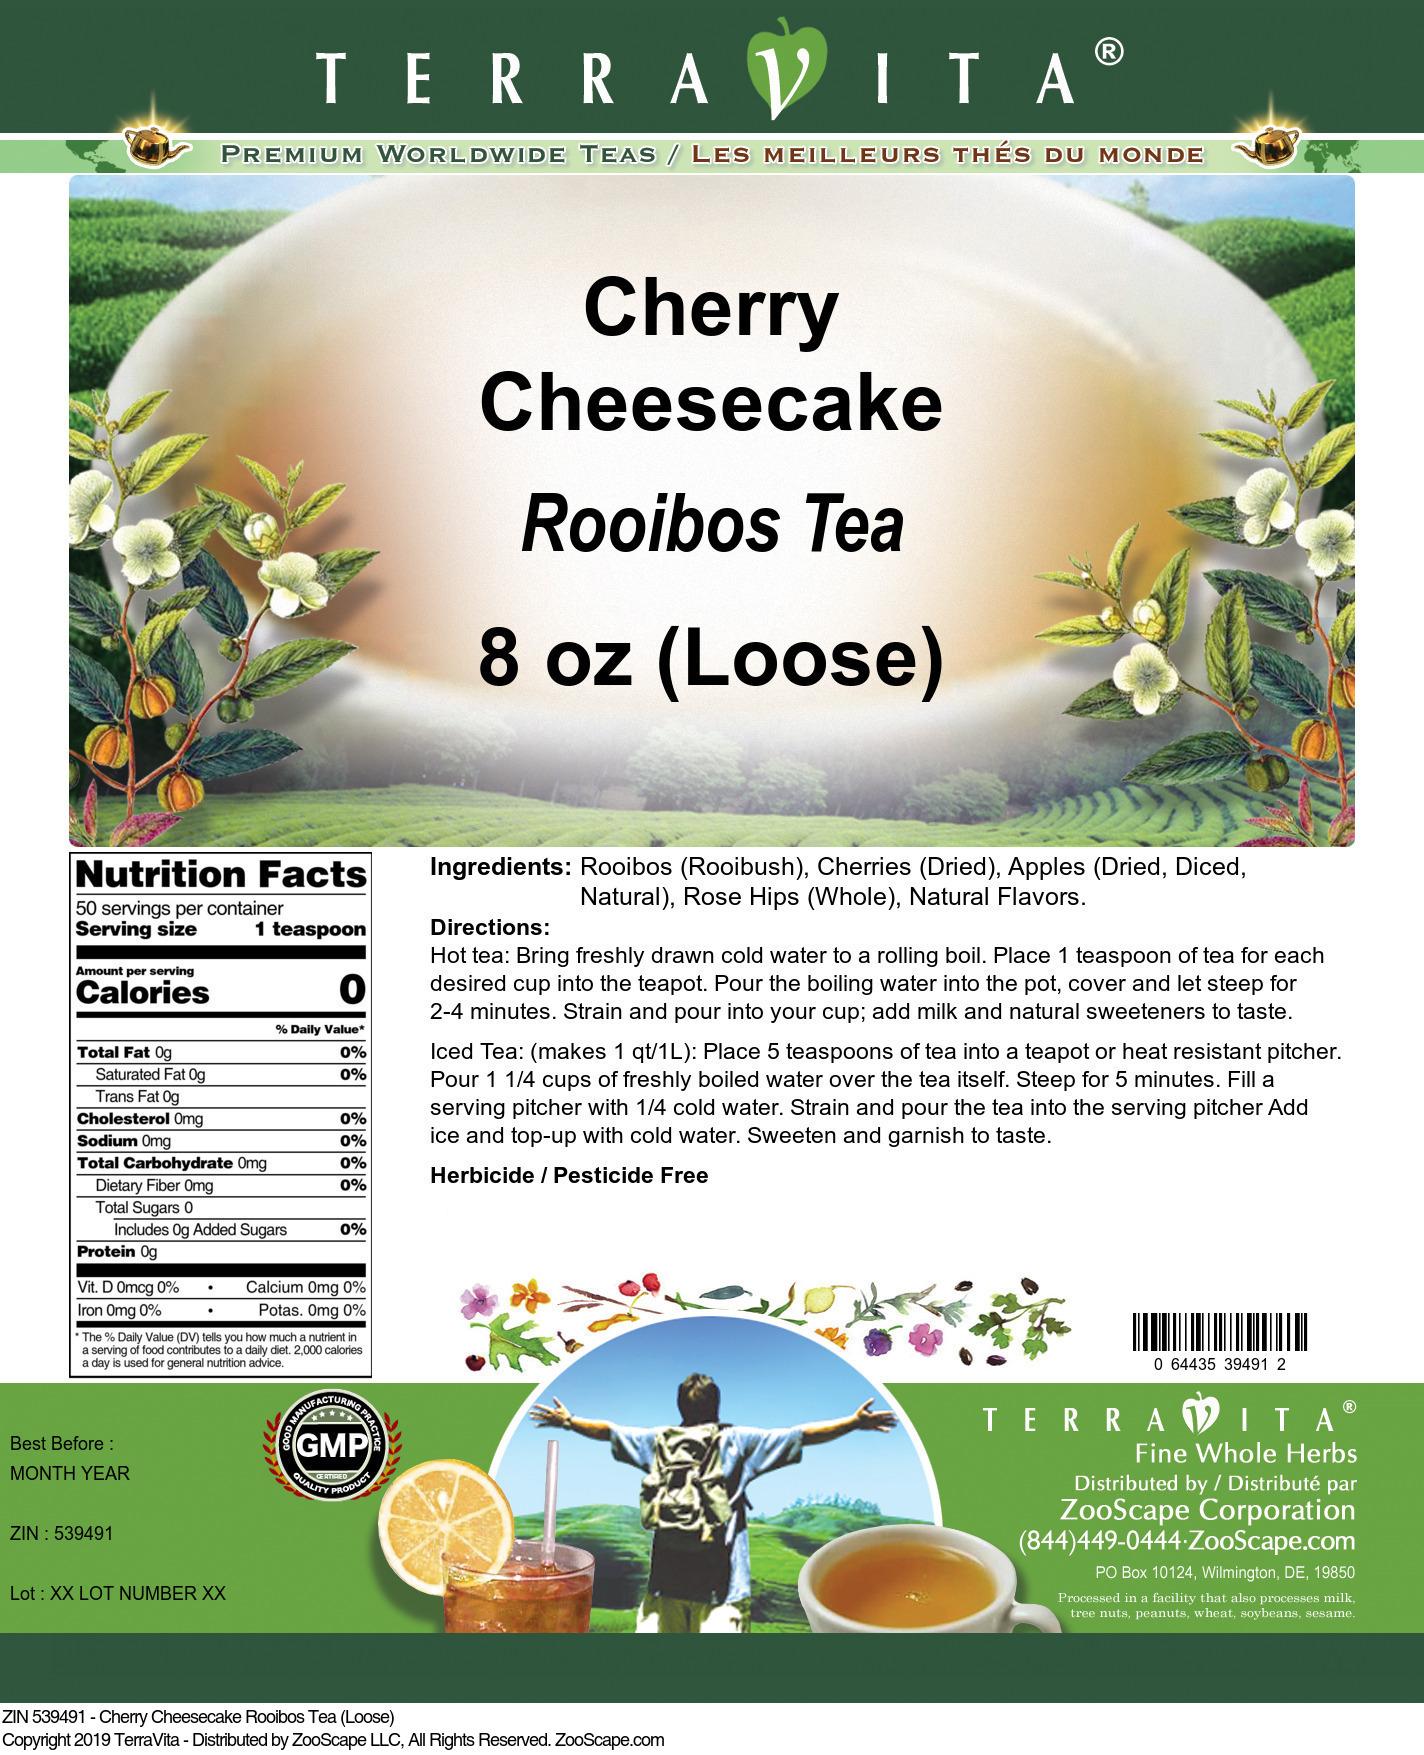 Cherry Cheesecake Rooibos Tea (Loose)